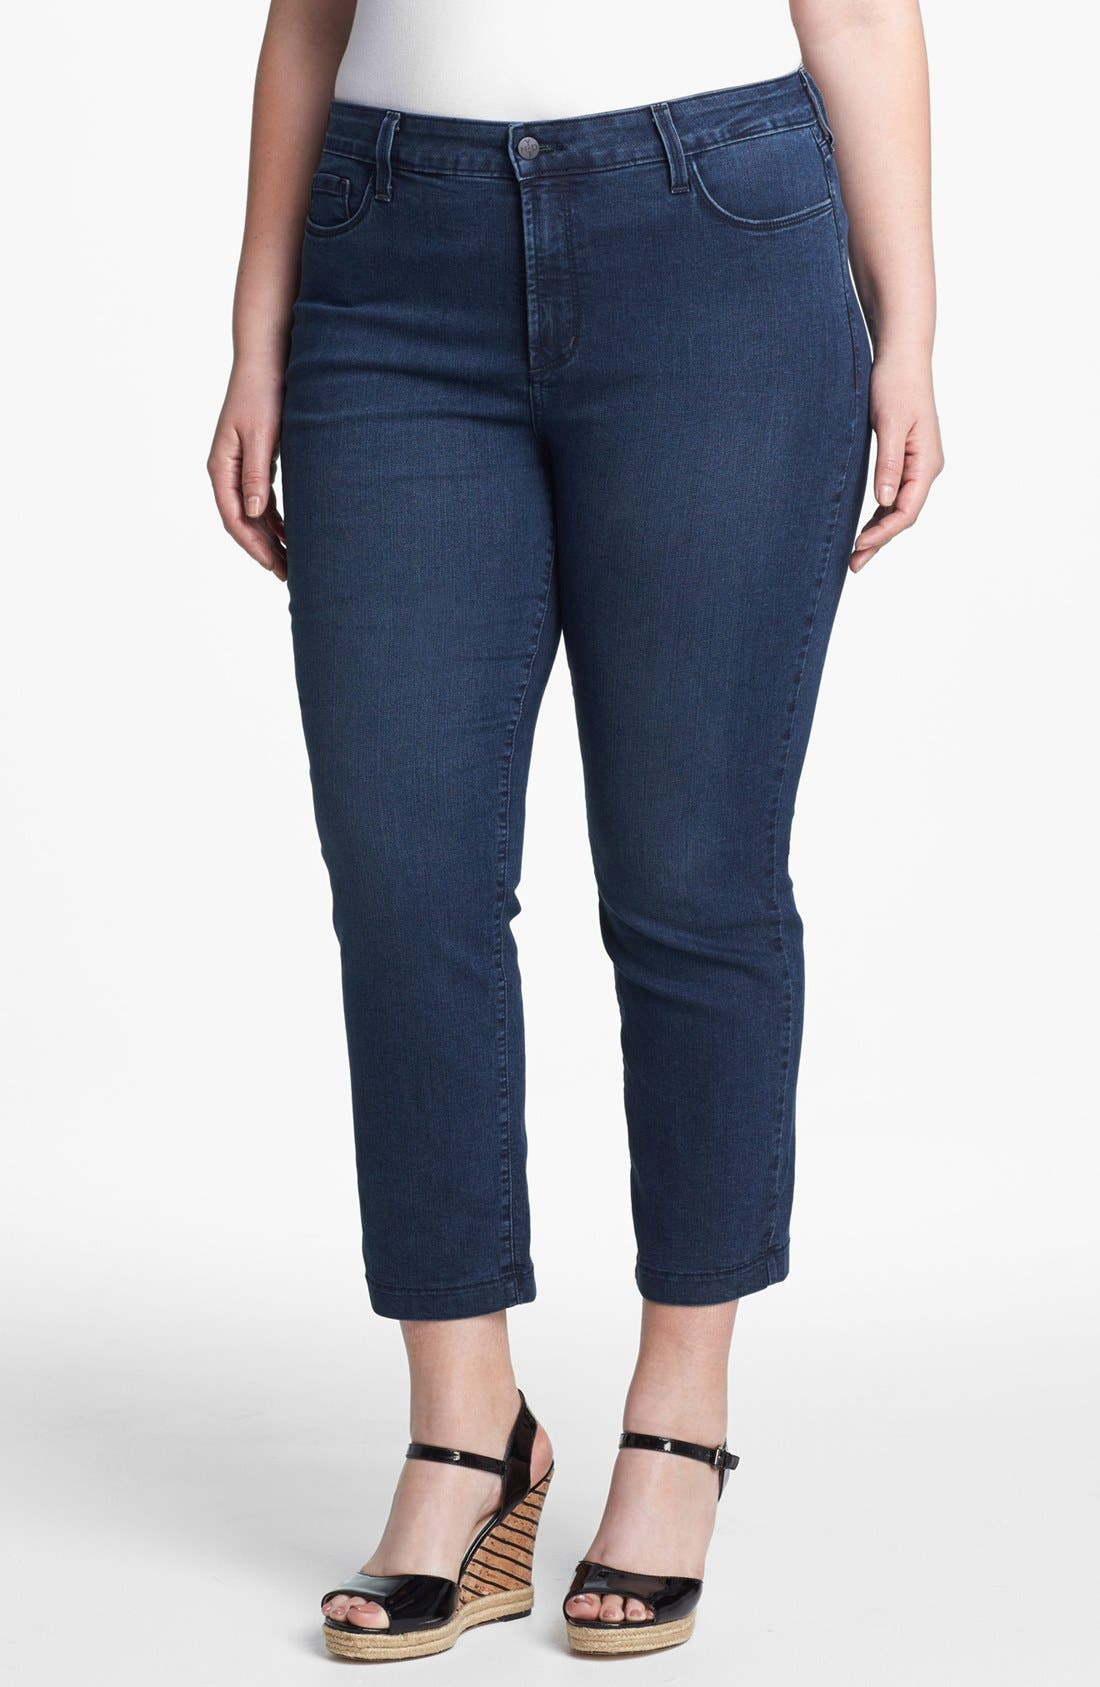 Main Image - NYDJ 'Audrey' Stretch Ankle Skinny Jeans (New York) (Plus Size)